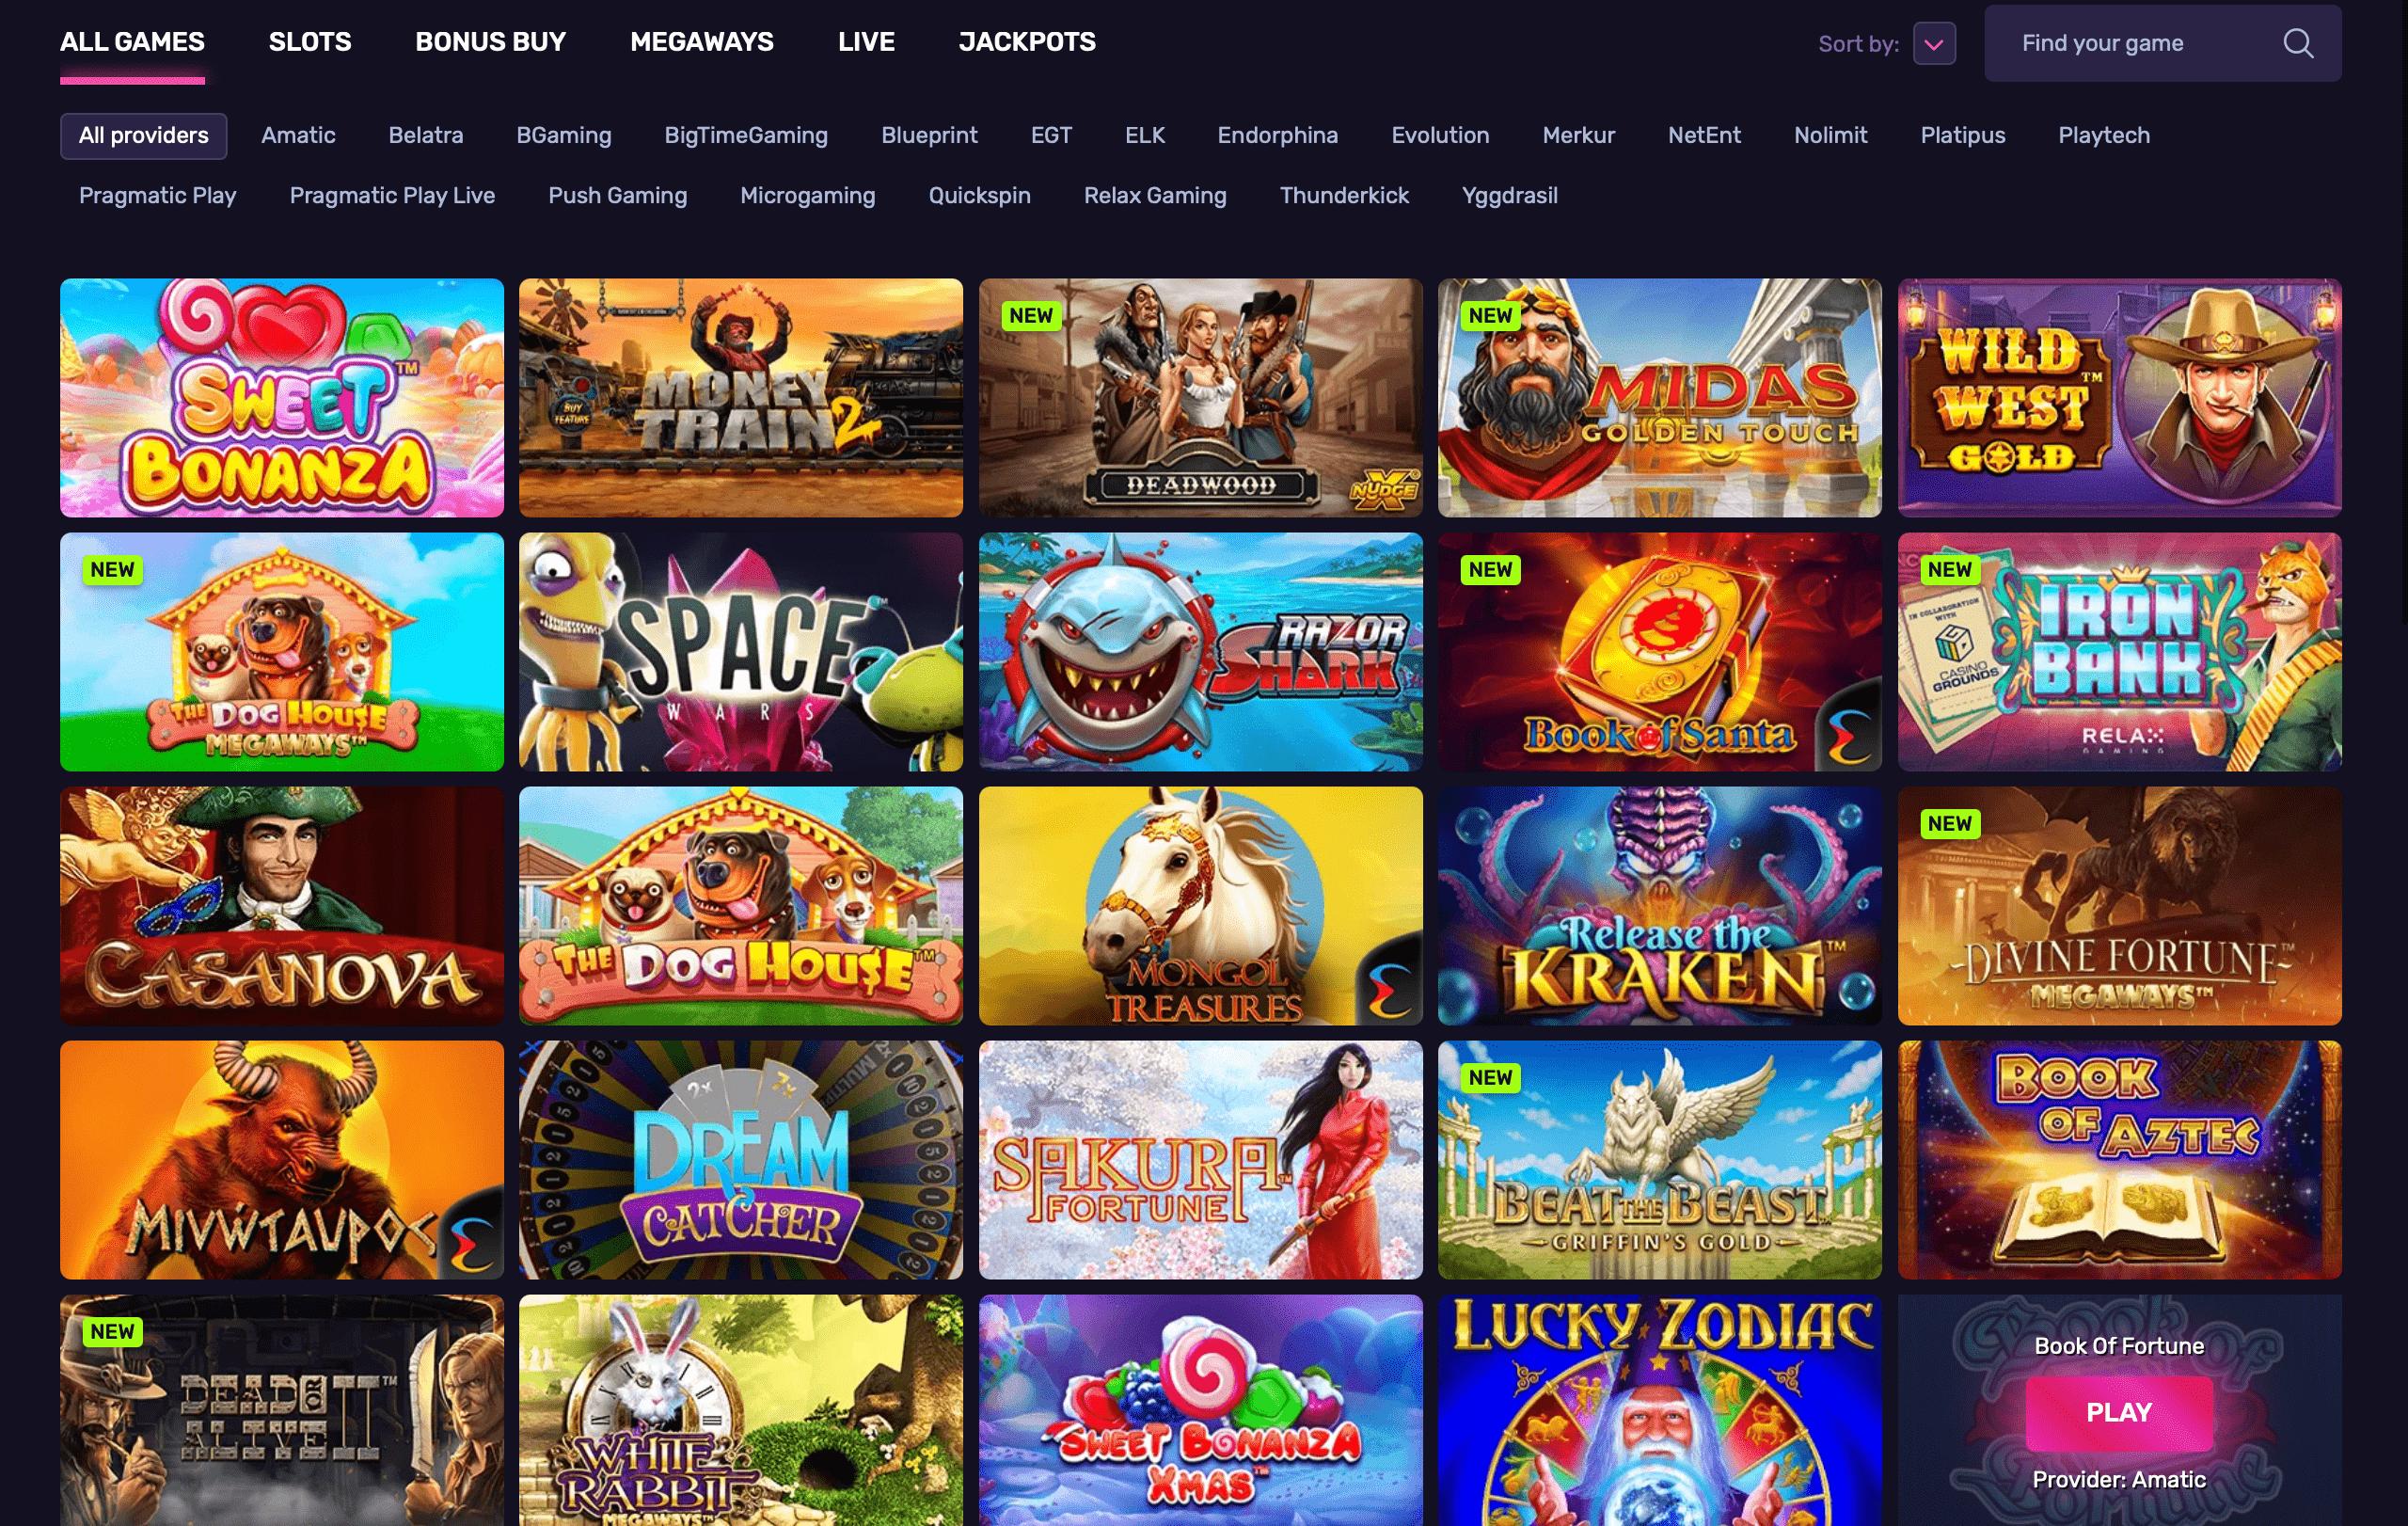 dlx casino games, casino games